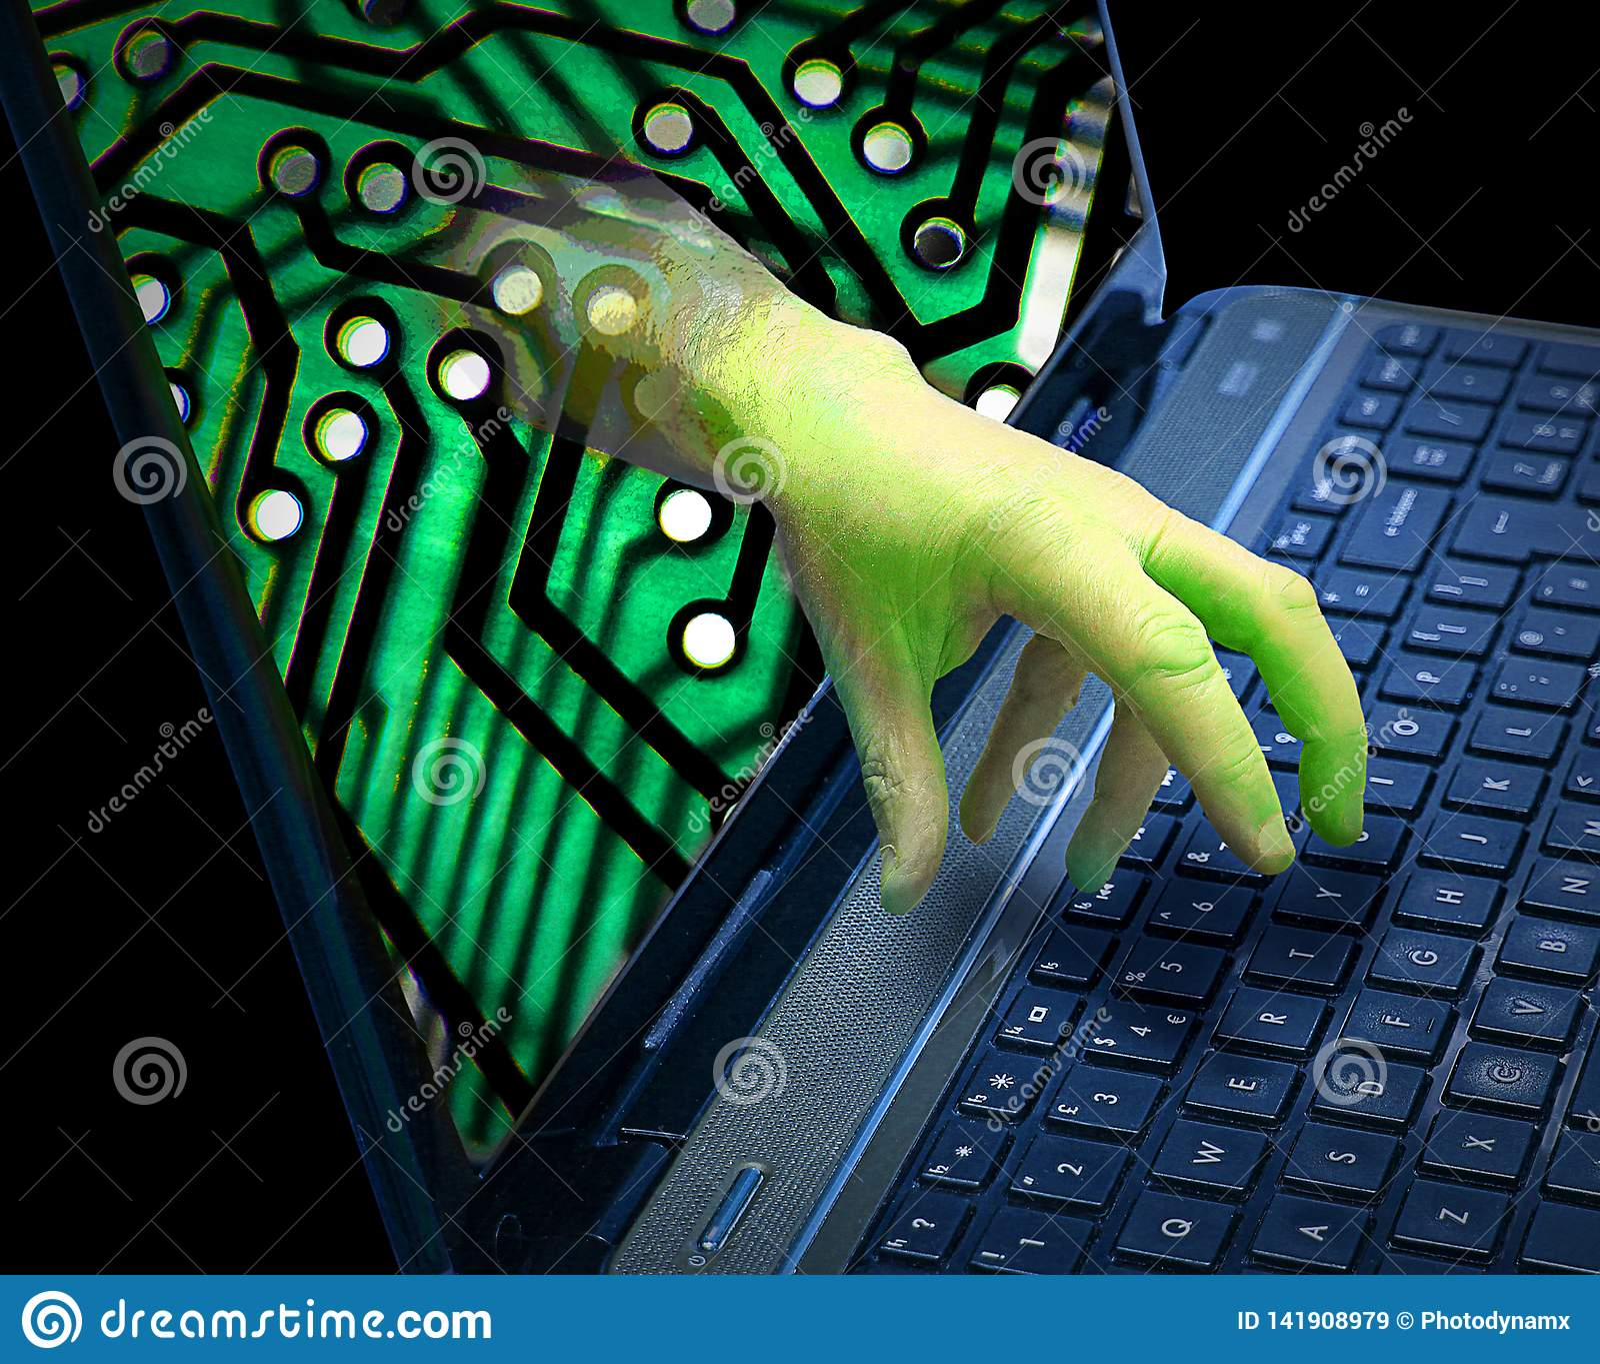 Cyber Internet Online Hacking Trojan Ransomware Phishing